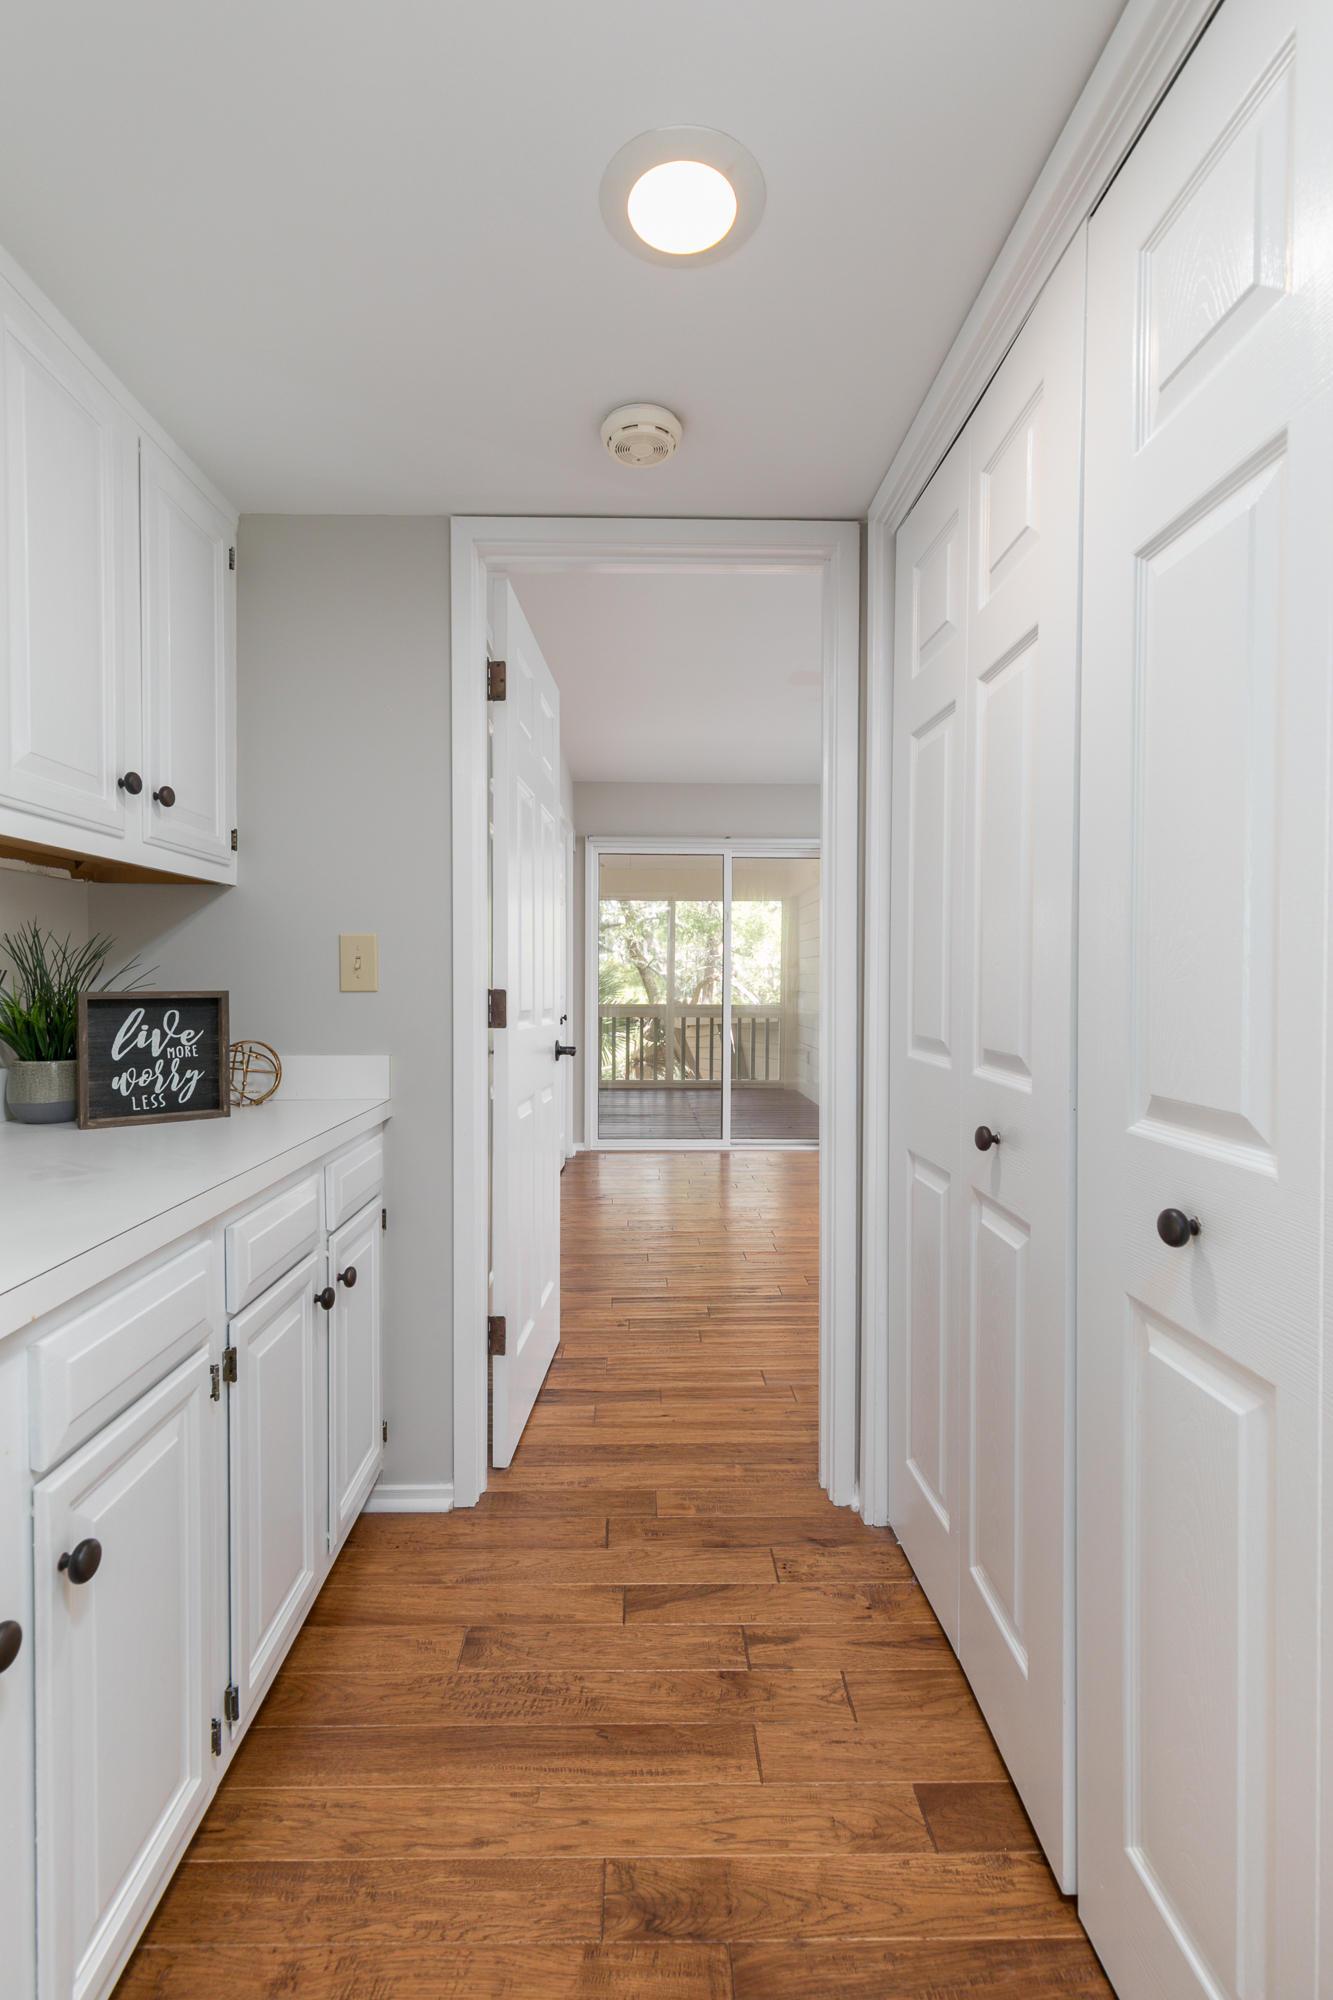 Seabrook Island Homes For Sale - 1004 Embassy Row, Seabrook Island, SC - 44